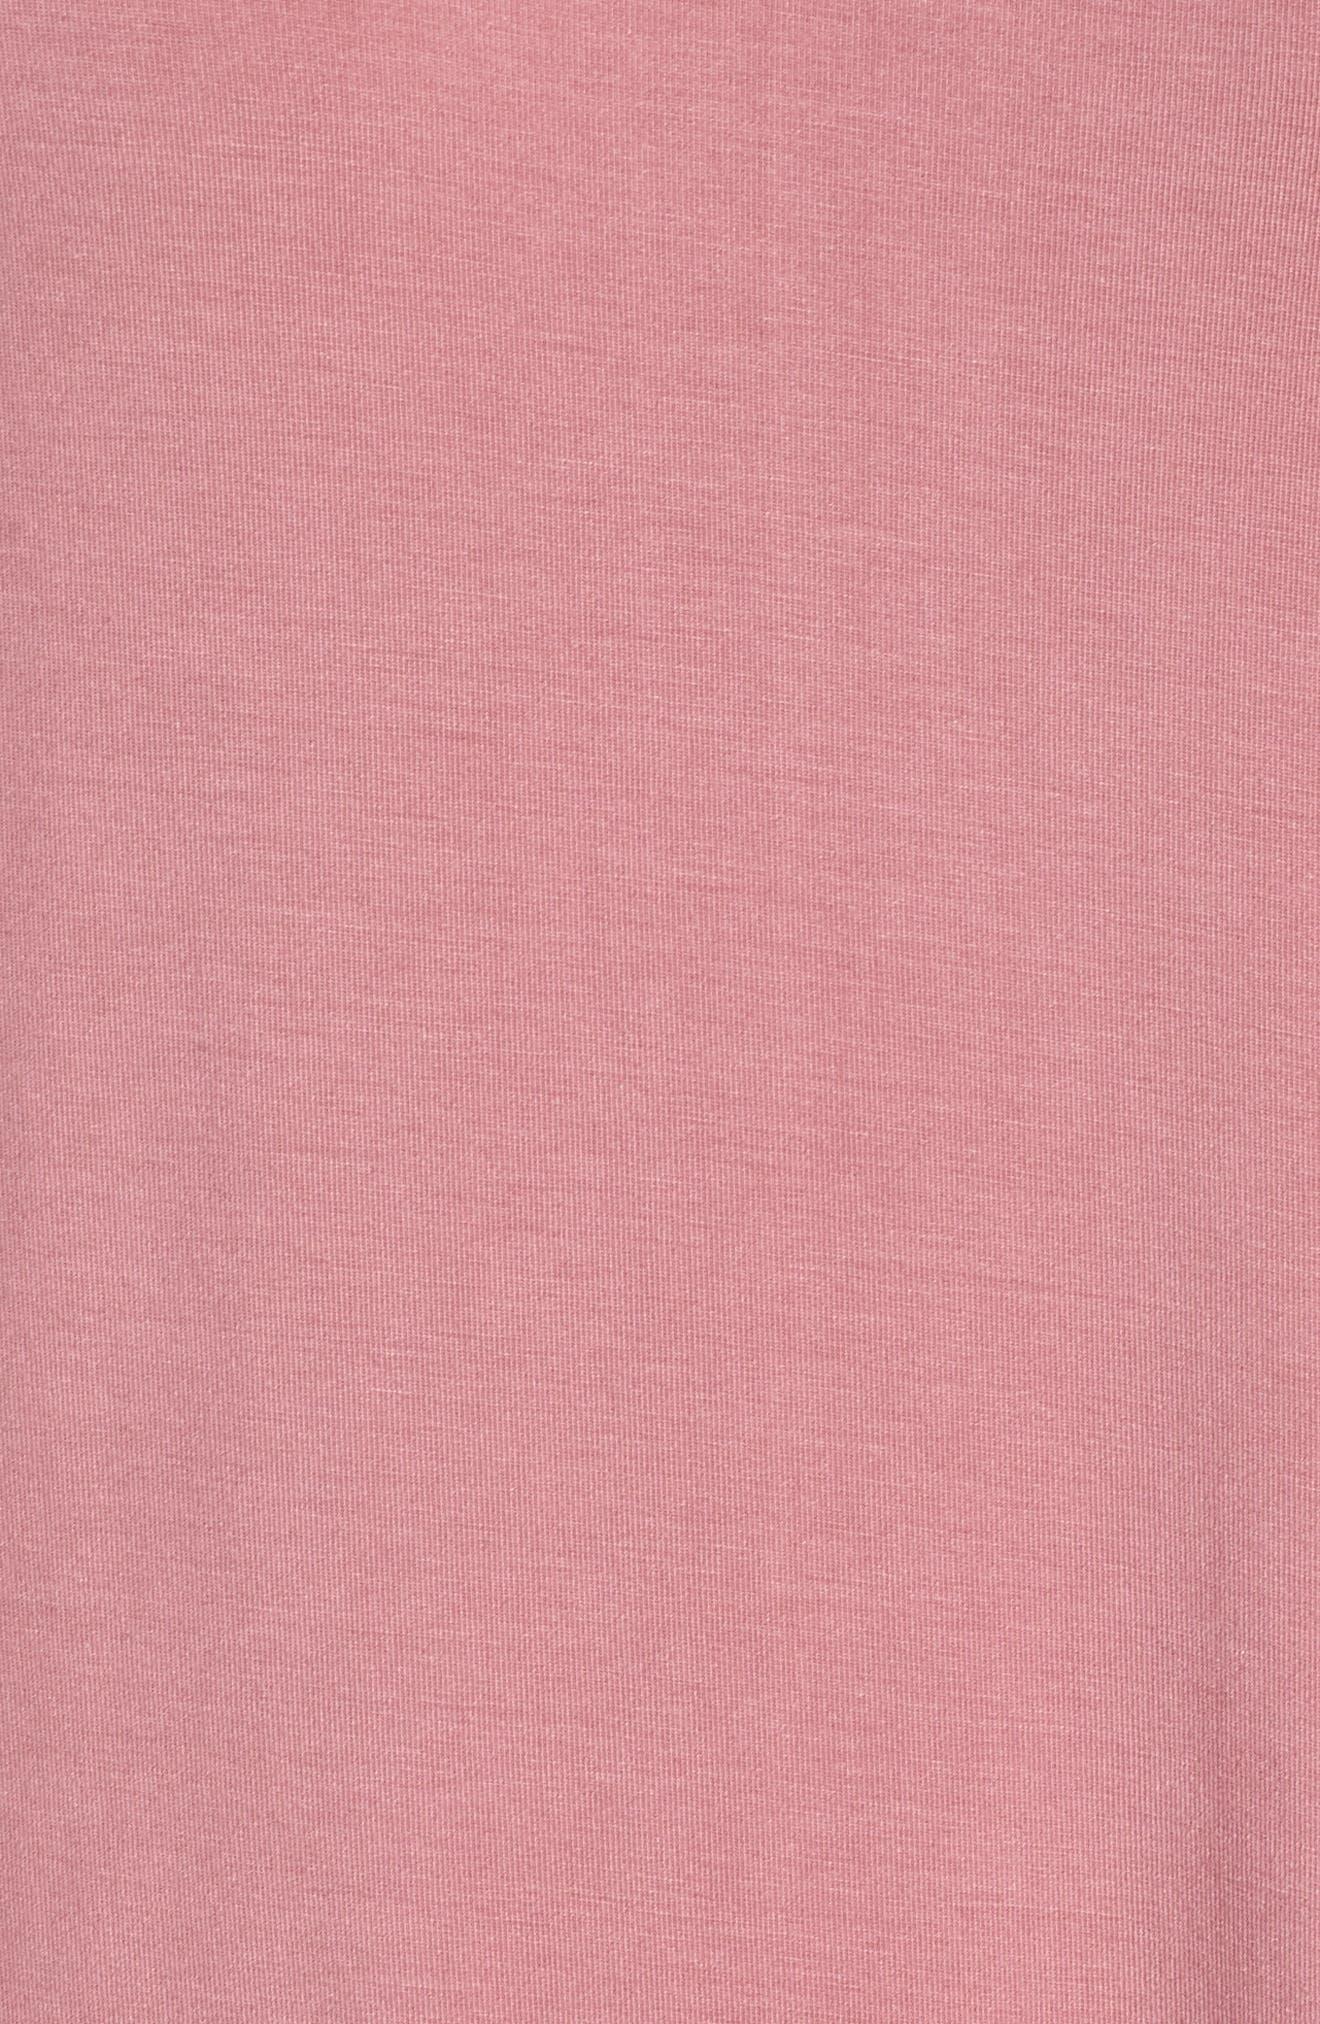 Dolman Sleeve Nightshirt,                             Alternate thumbnail 29, color,